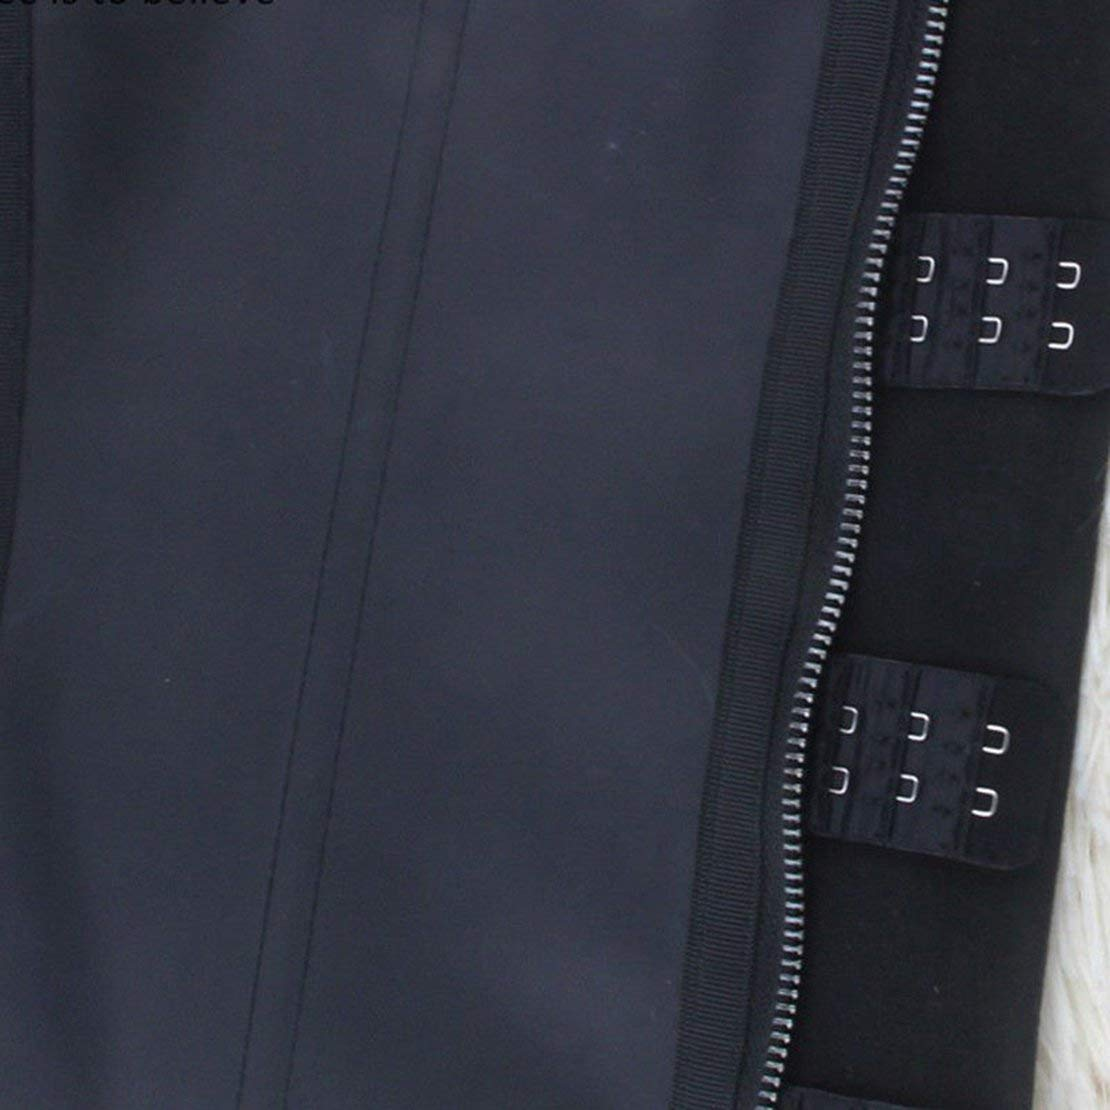 Sanzhileg Waist Trainer Belt Underwear Body Shaper Breathable Women Corsets with Zipper Hot Shapers Cincher Corset Top Slimming Belt Black 2XL